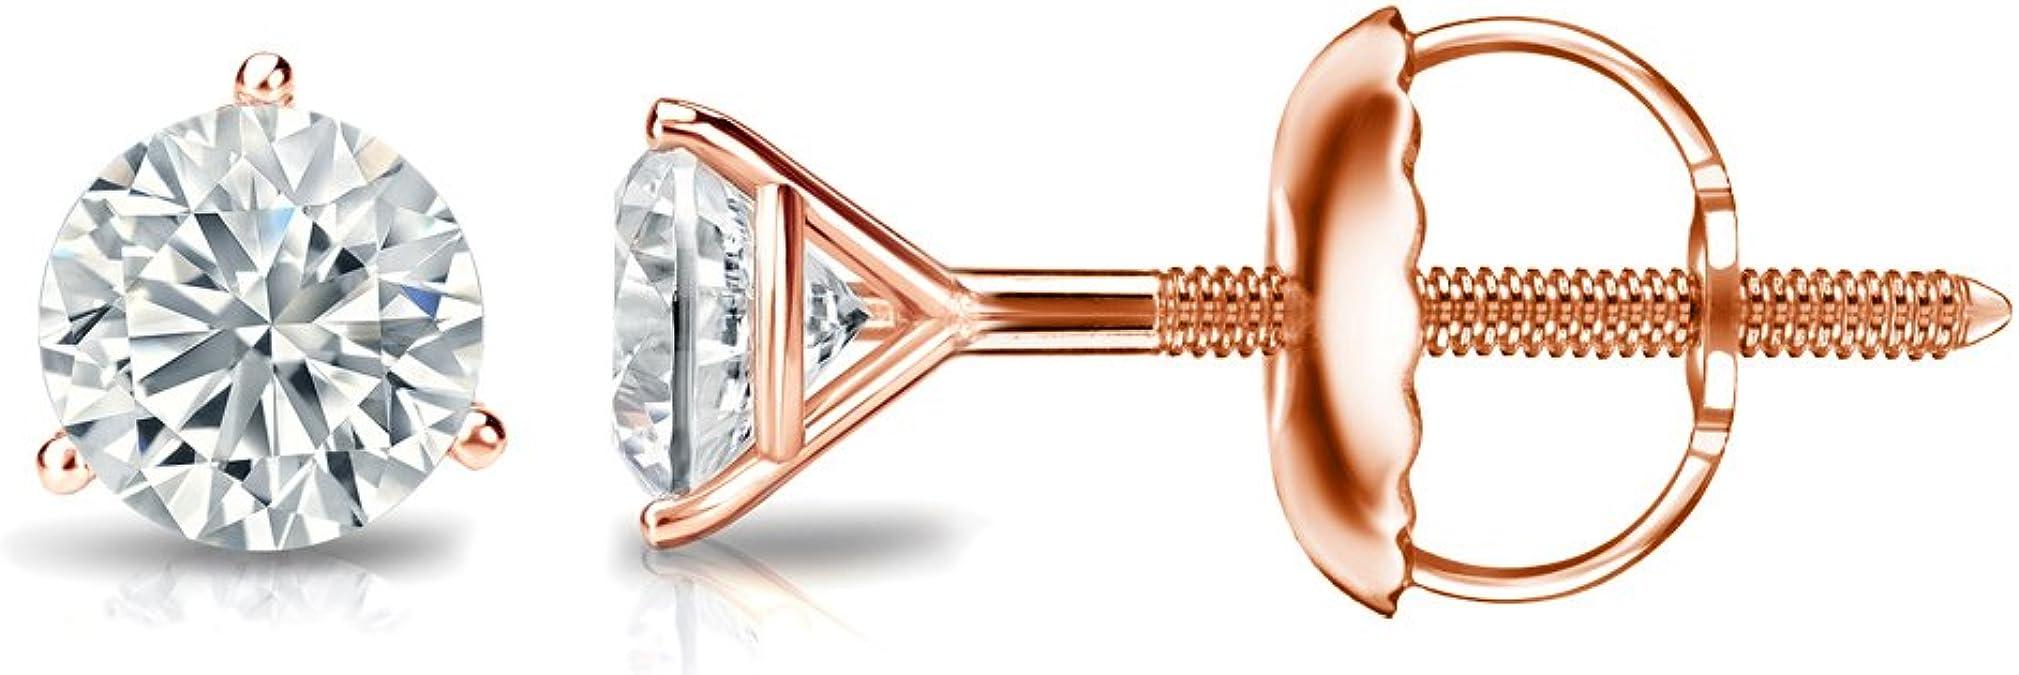 0.08cttw, Good, SI2-I1 Screw-Back Diamond Wish 14k Gold Round SINGLE Diamond Stud Earring Bezel Set